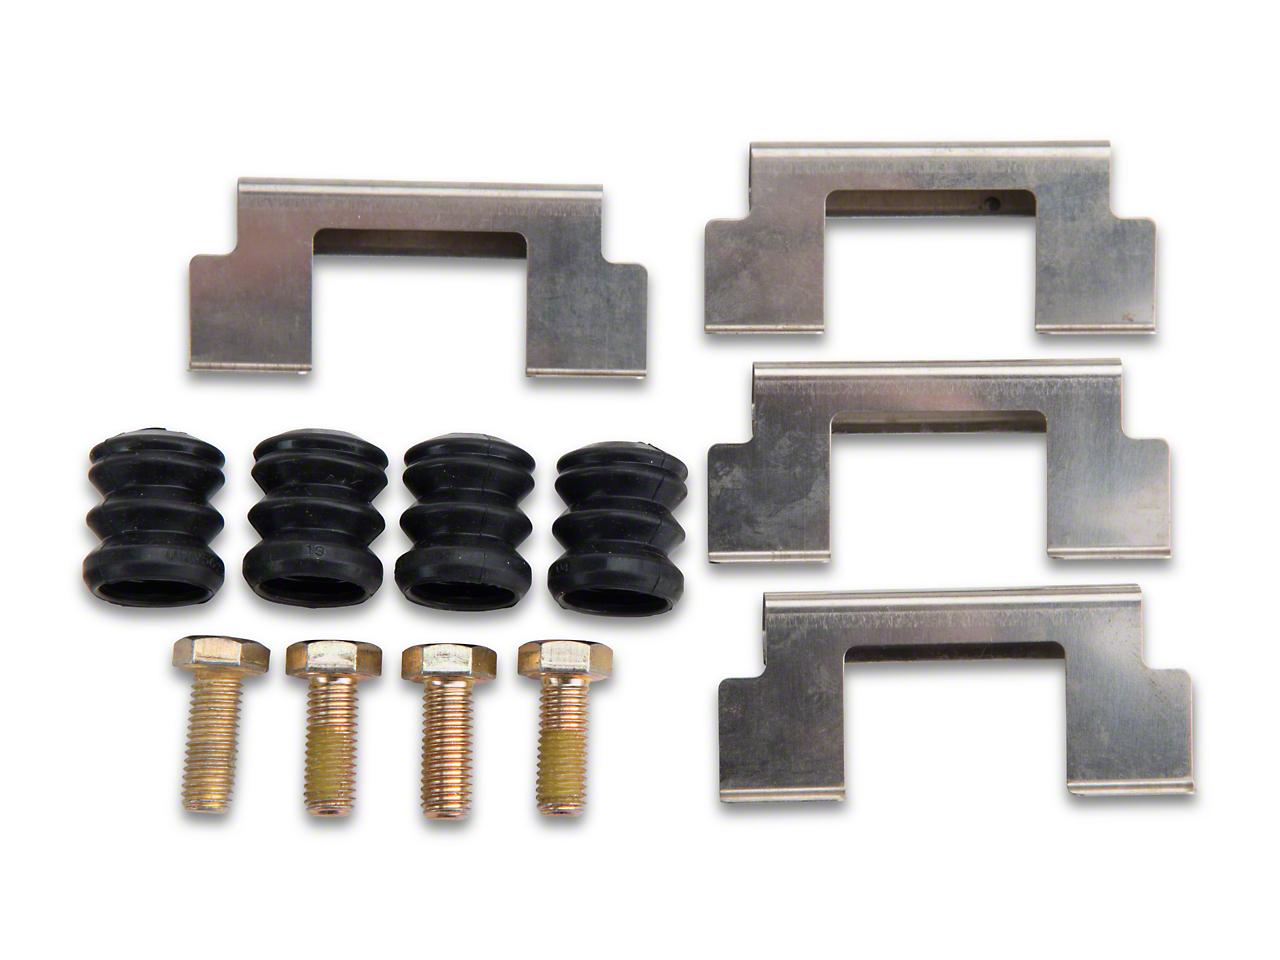 Rear Disc Brake Hardware Kit (93 Cobra)